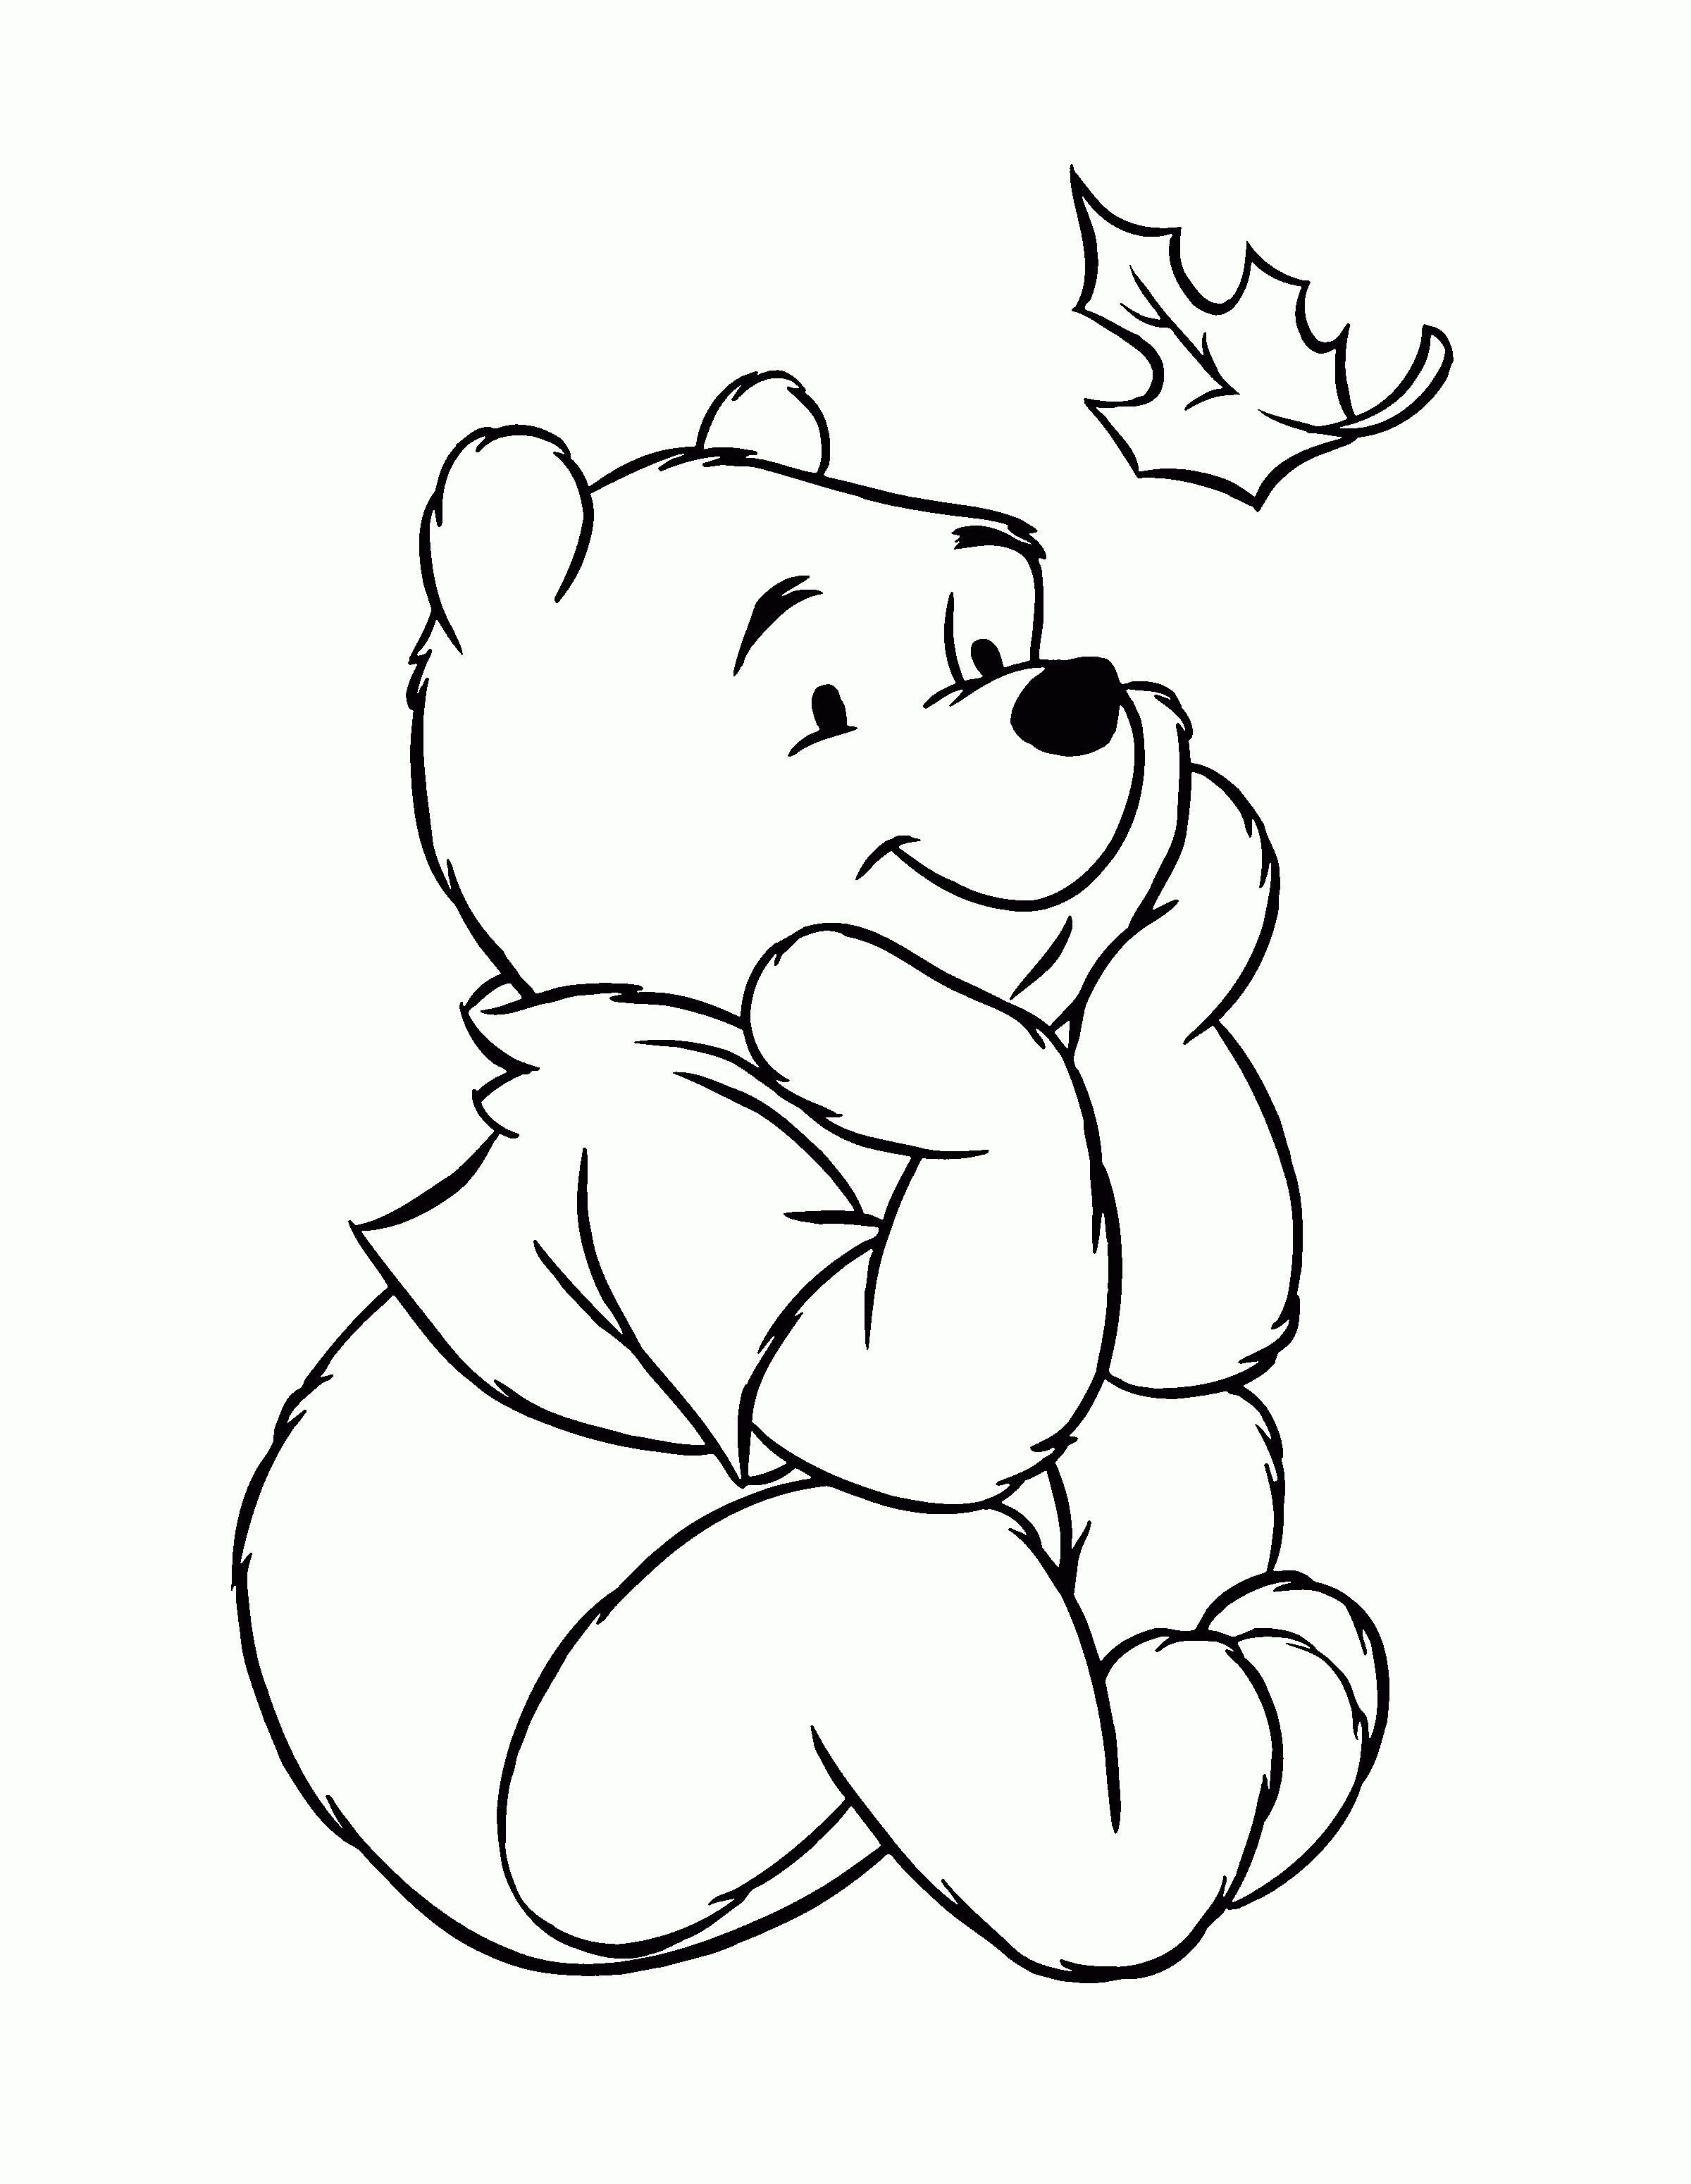 Malvorlagen Winnie Pooh Genial I1 Wp Phgraphics 2018 0 Elegant Ausmalbilder Winnie Puuh Stock